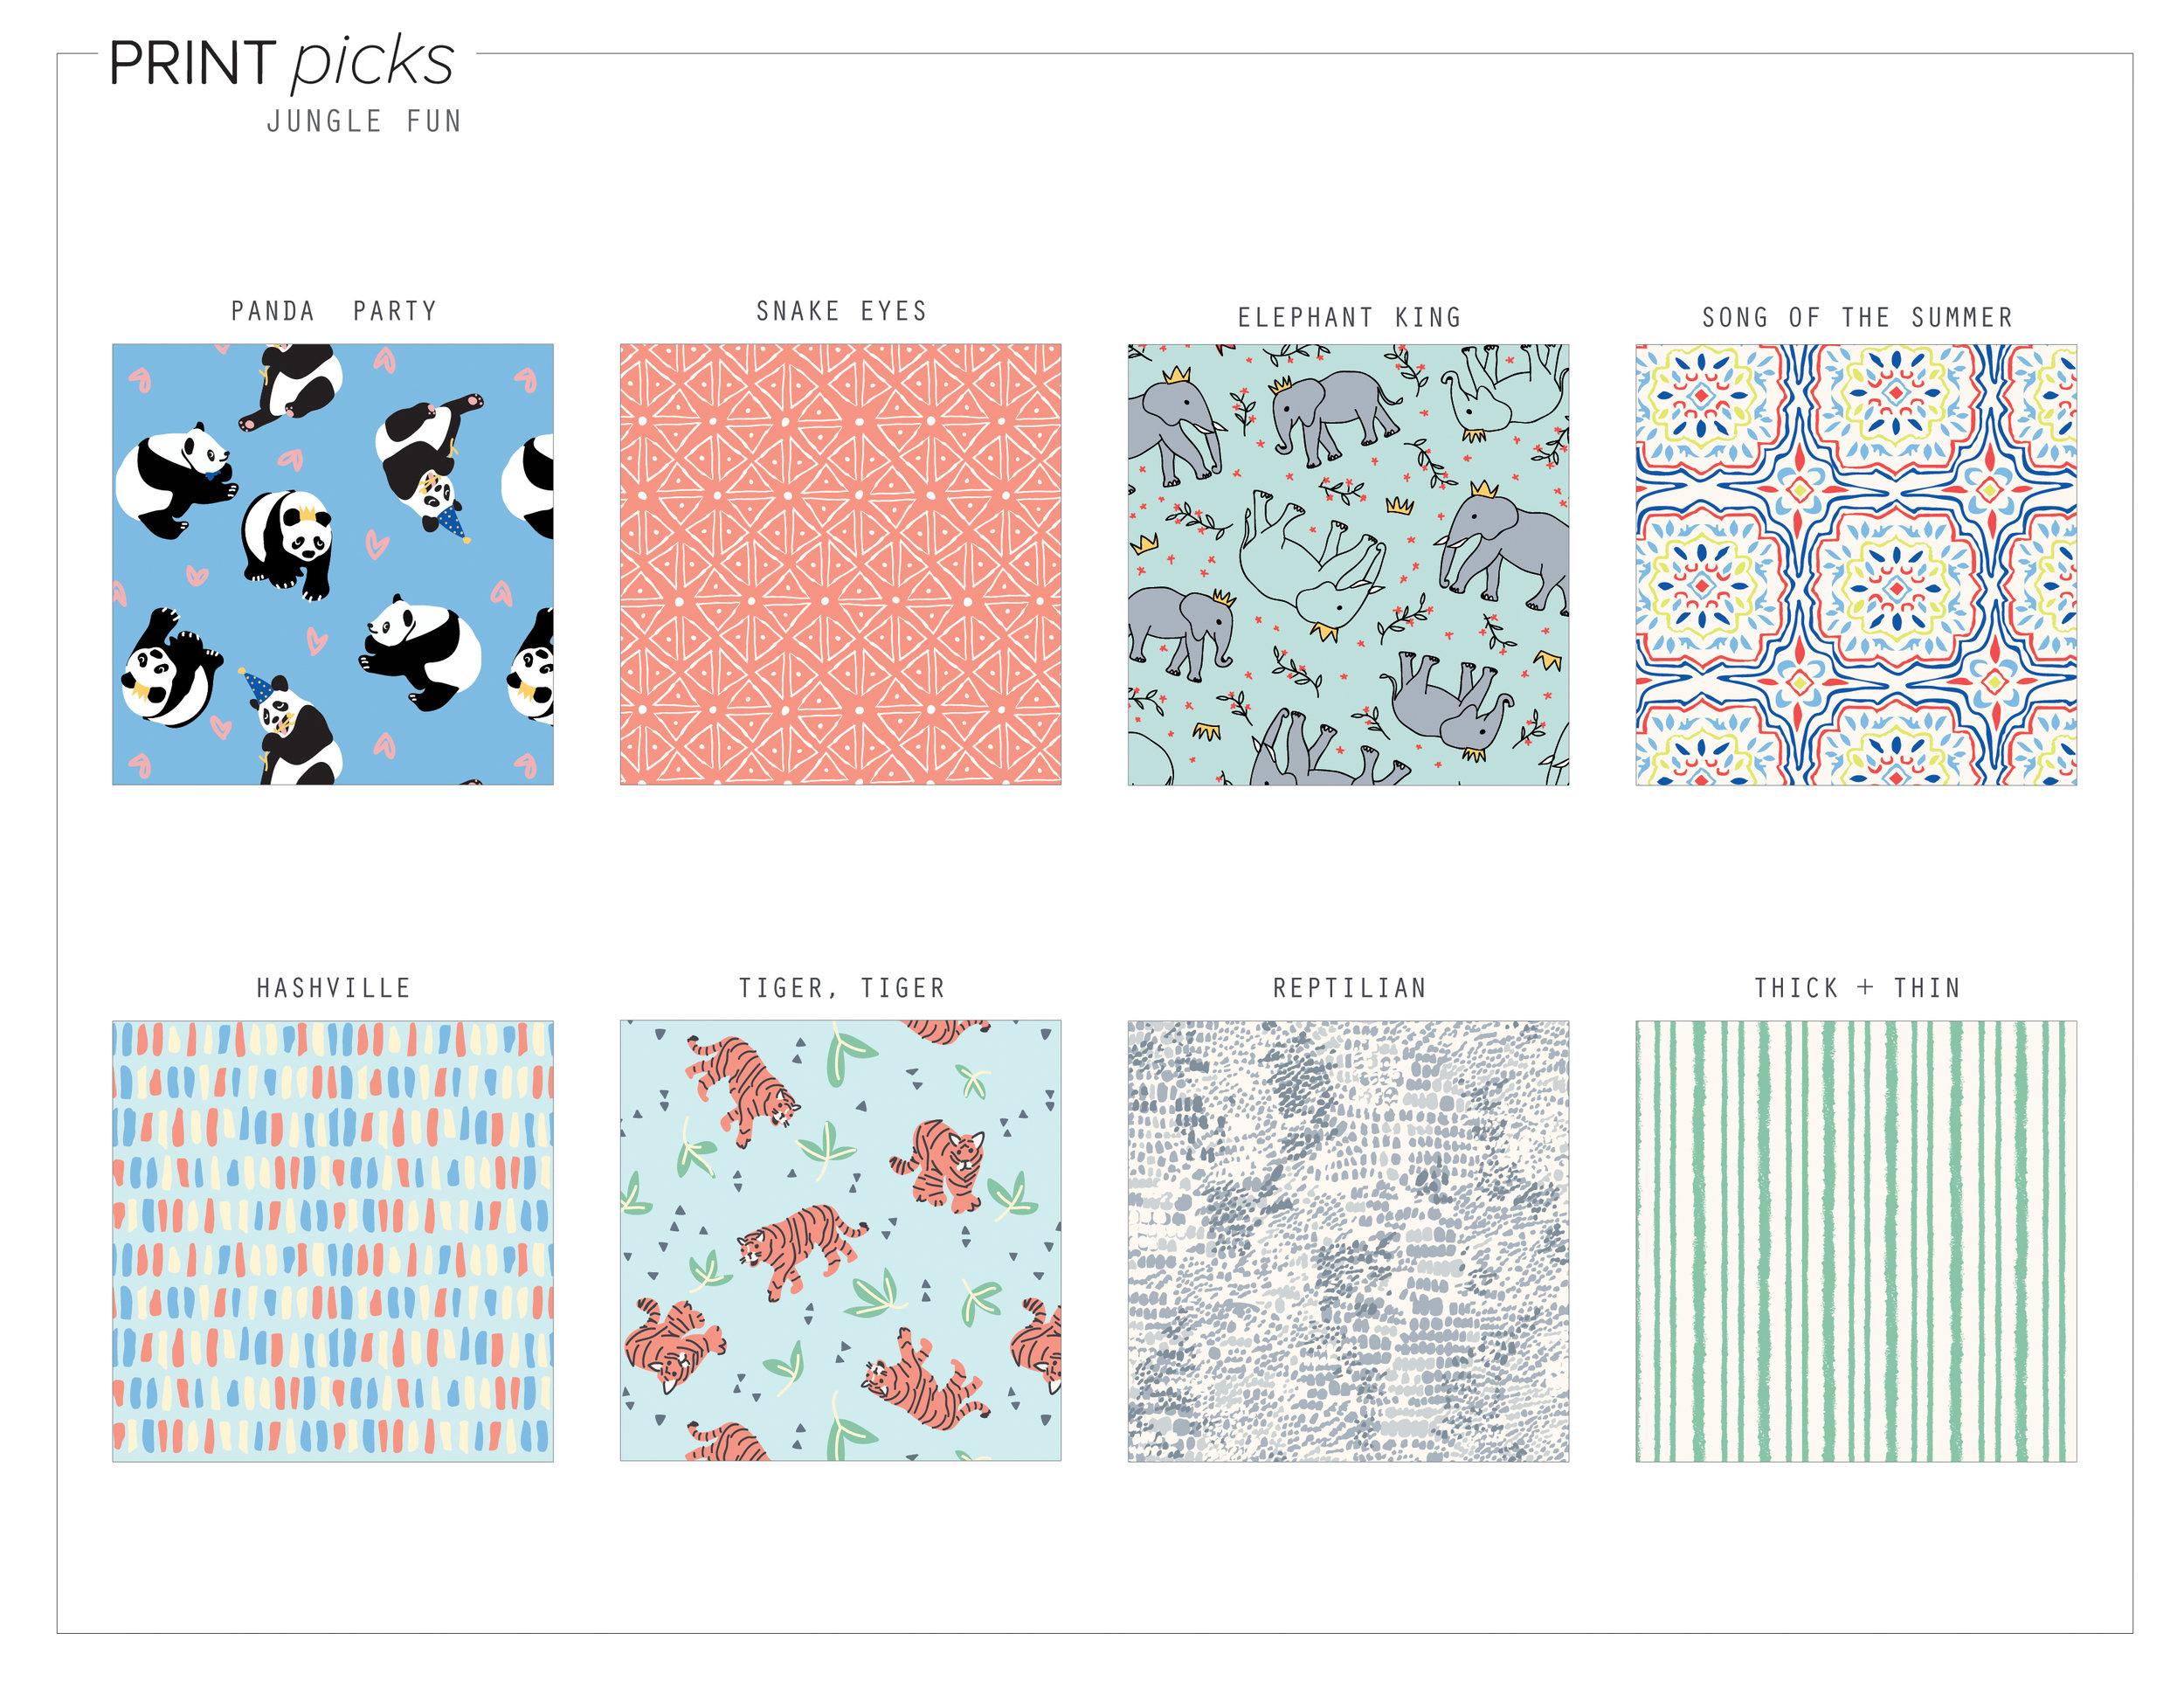 Print-Picks-JUNGLE-FUN.jpg